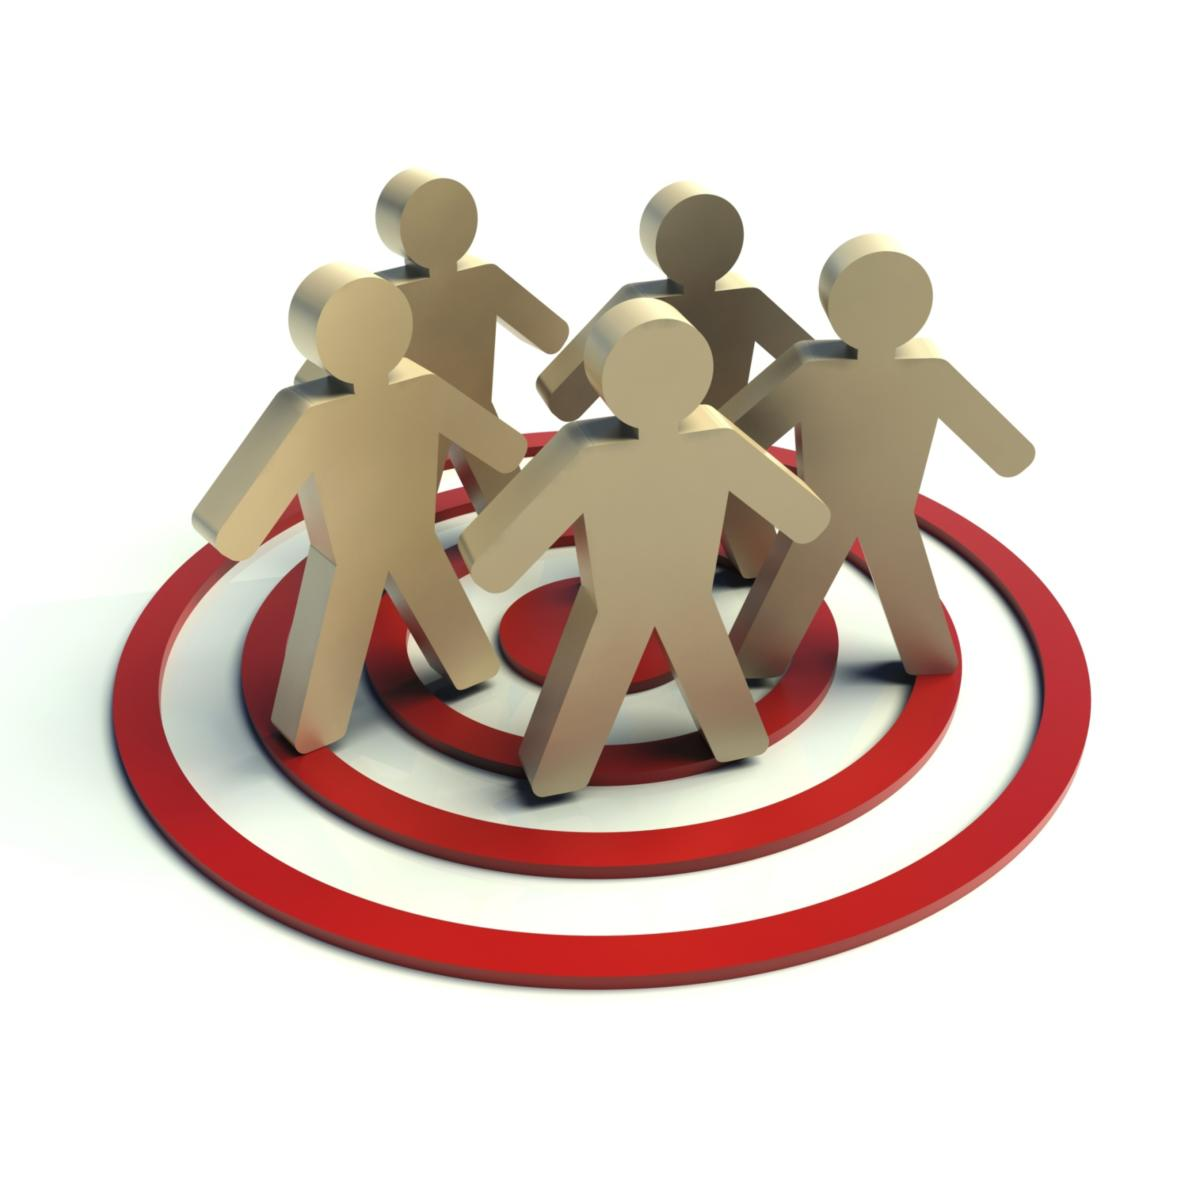 team target thinkstock